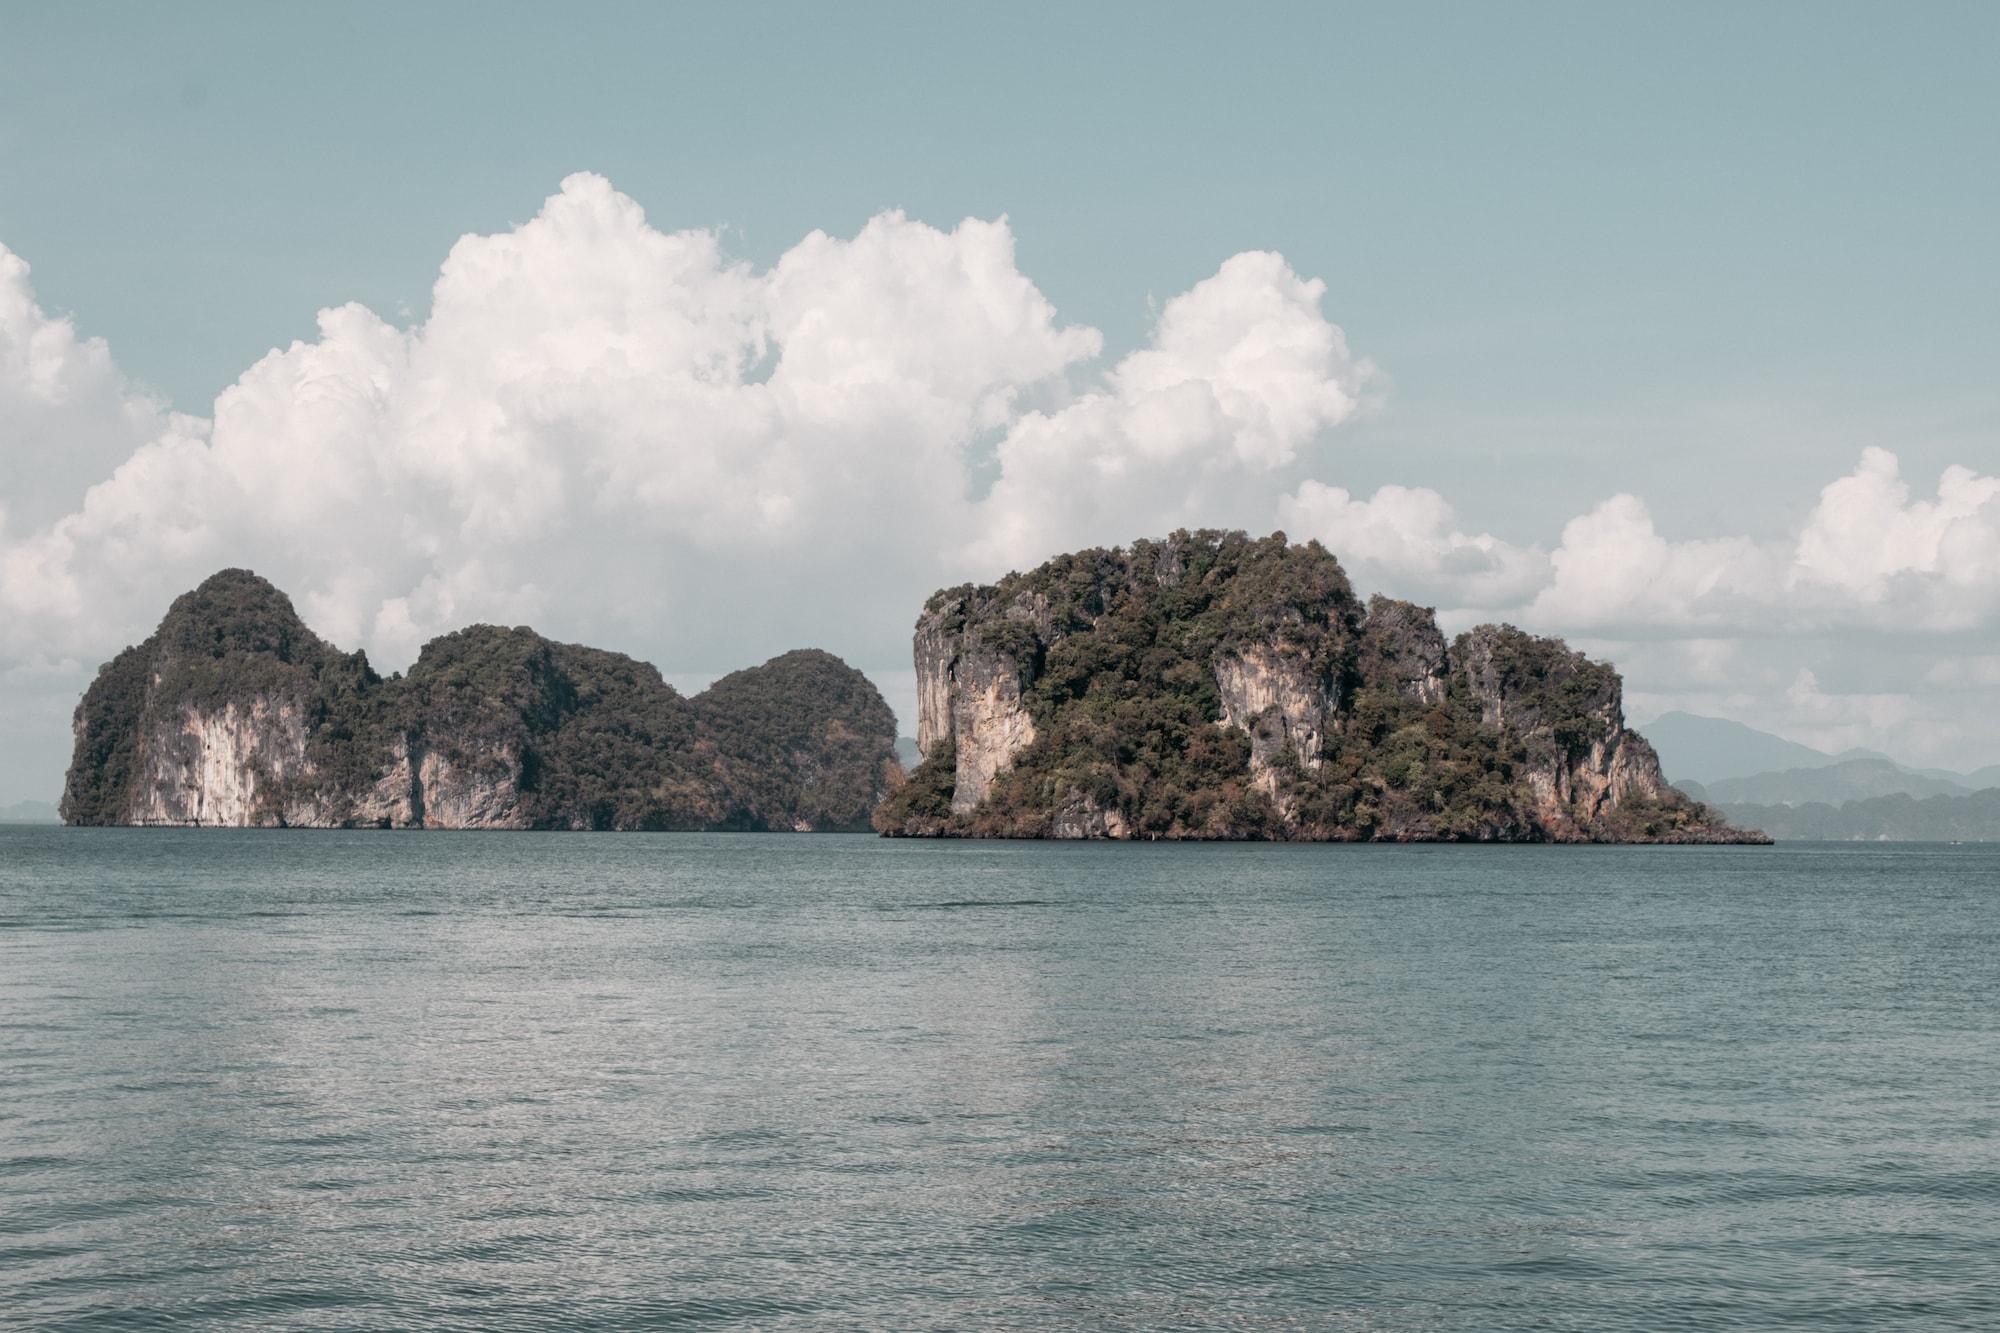 krabi tipps boots tour vier islands